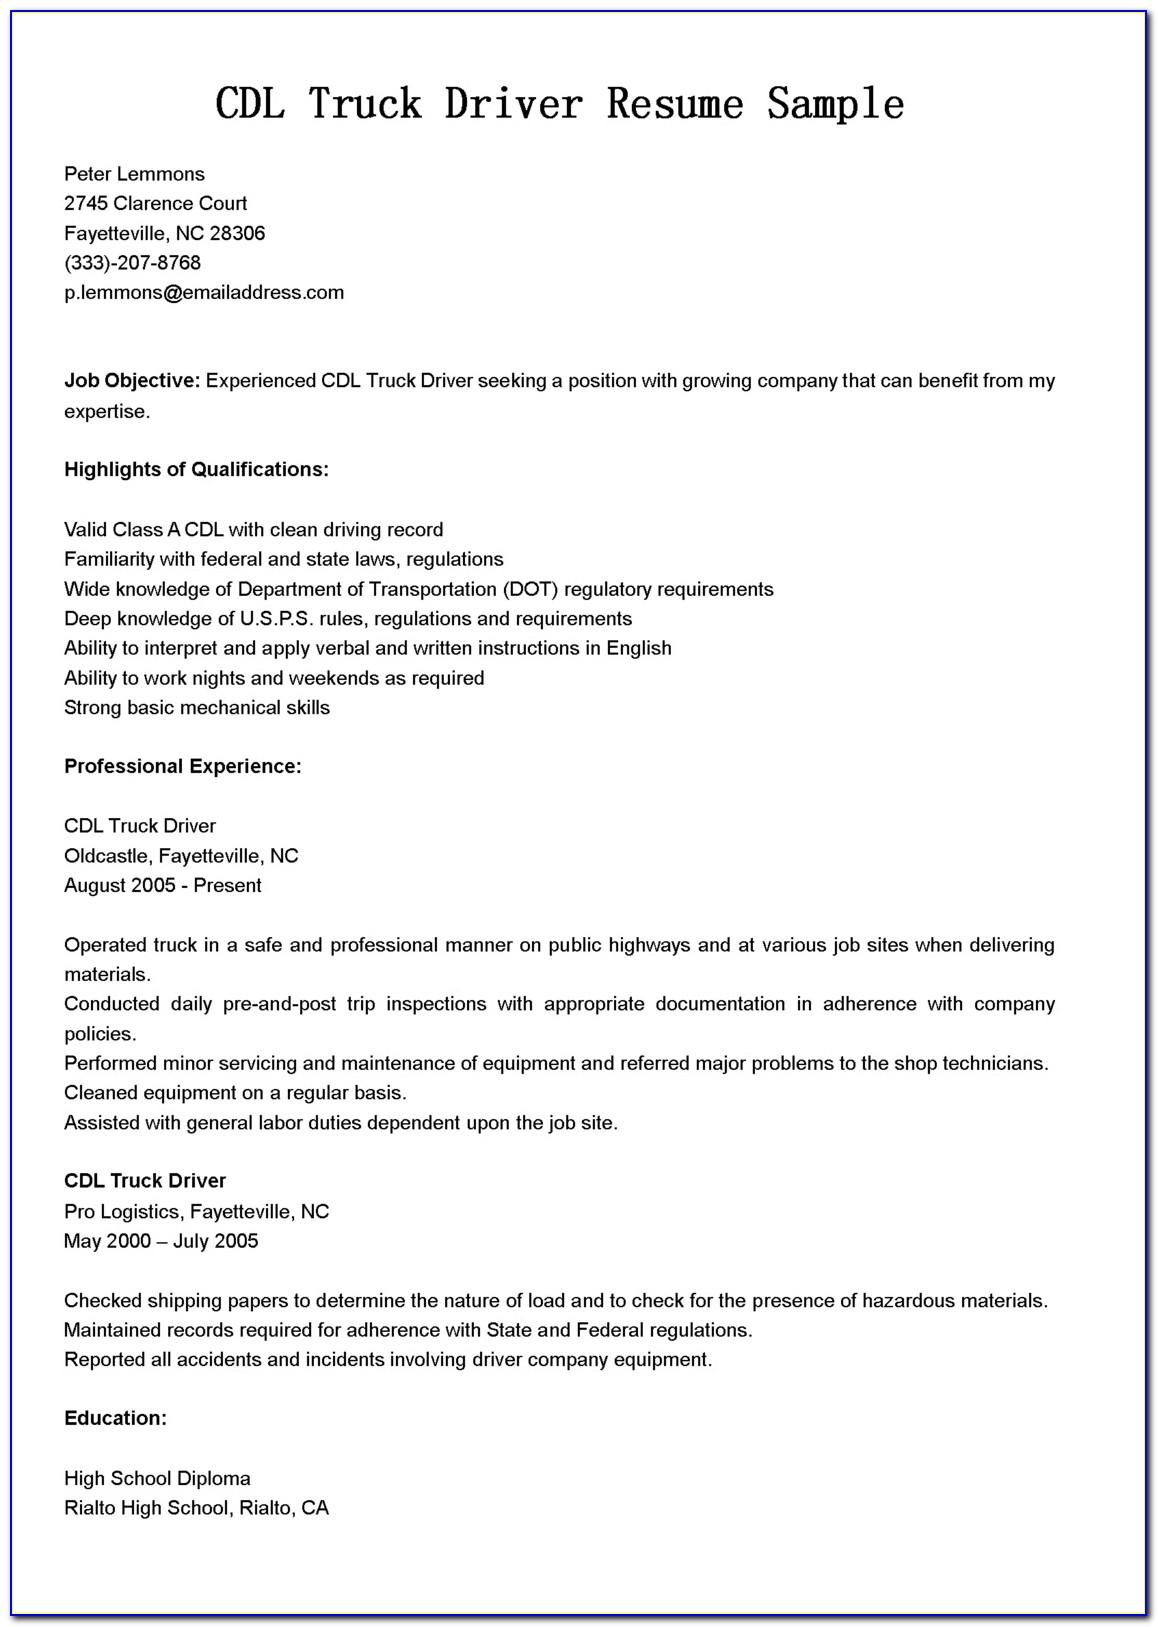 Cdl Truck Driver Job Description For Resume